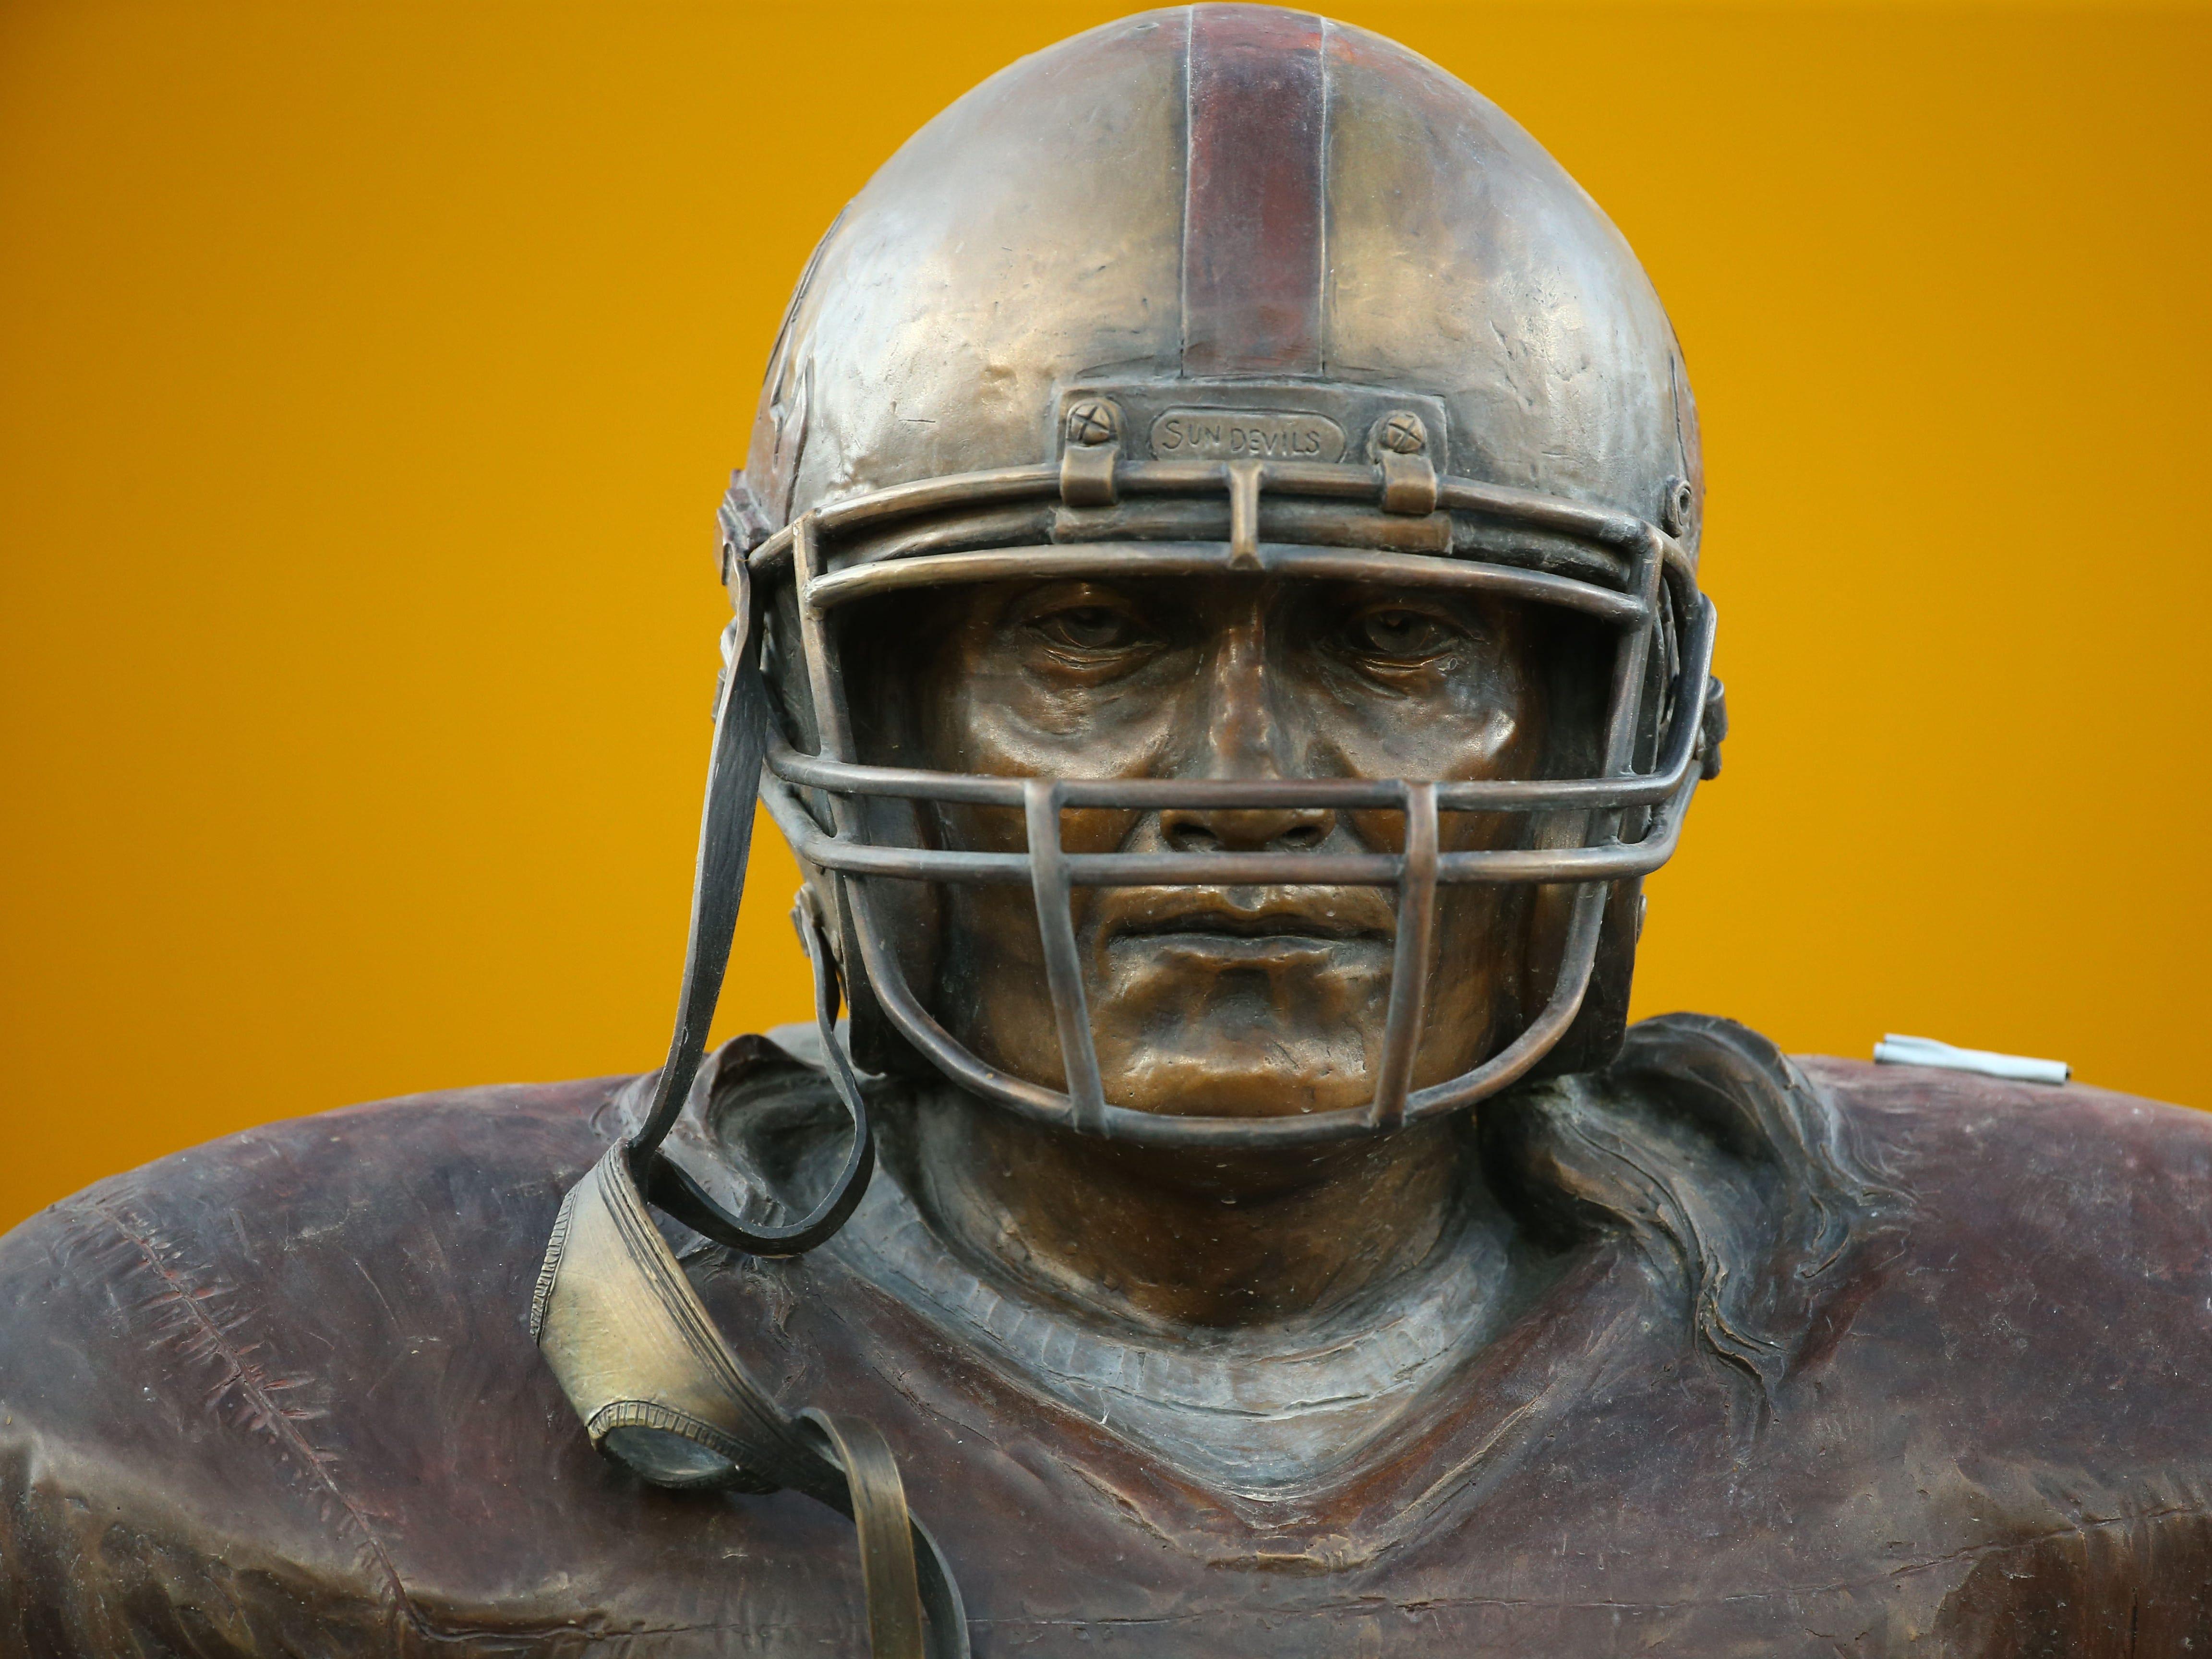 Pat Tillman statue during the Michigan State game on Sep. 8, 2018, at Sun Devil Stadium.